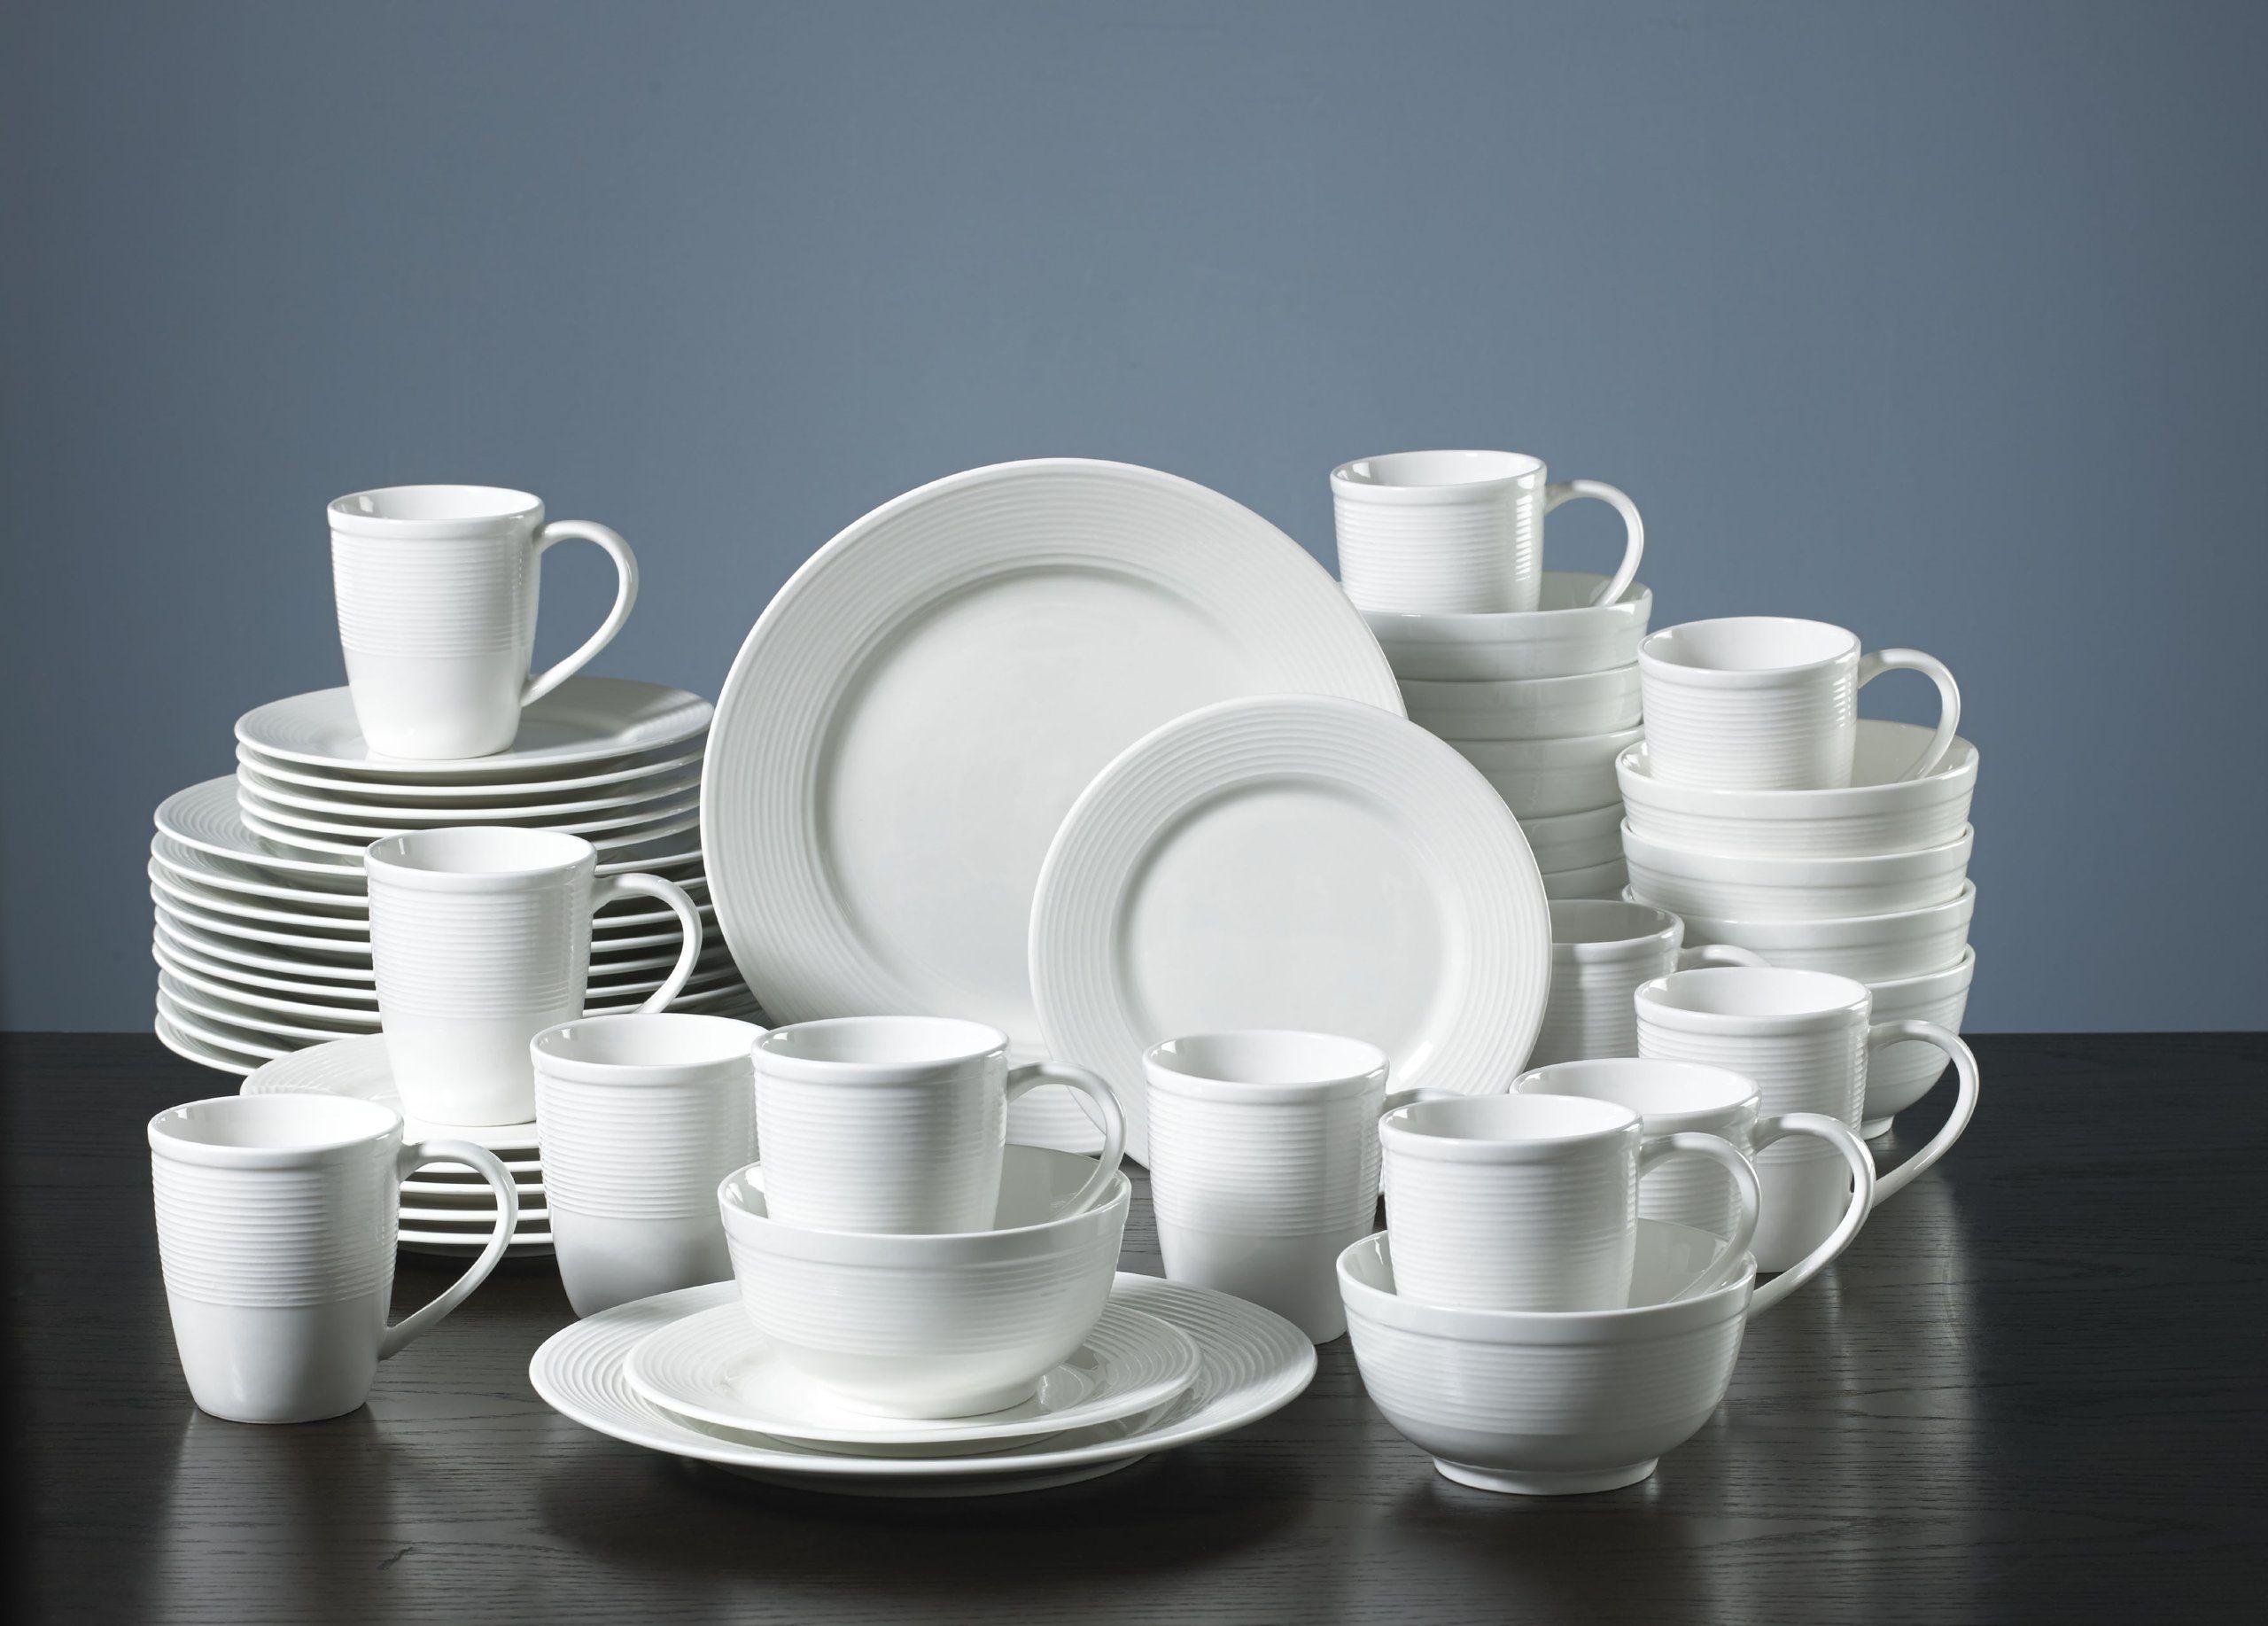 Amazon.com: Gorham Pickwick 48-Piece Dinnerware Set: Place Settings ...